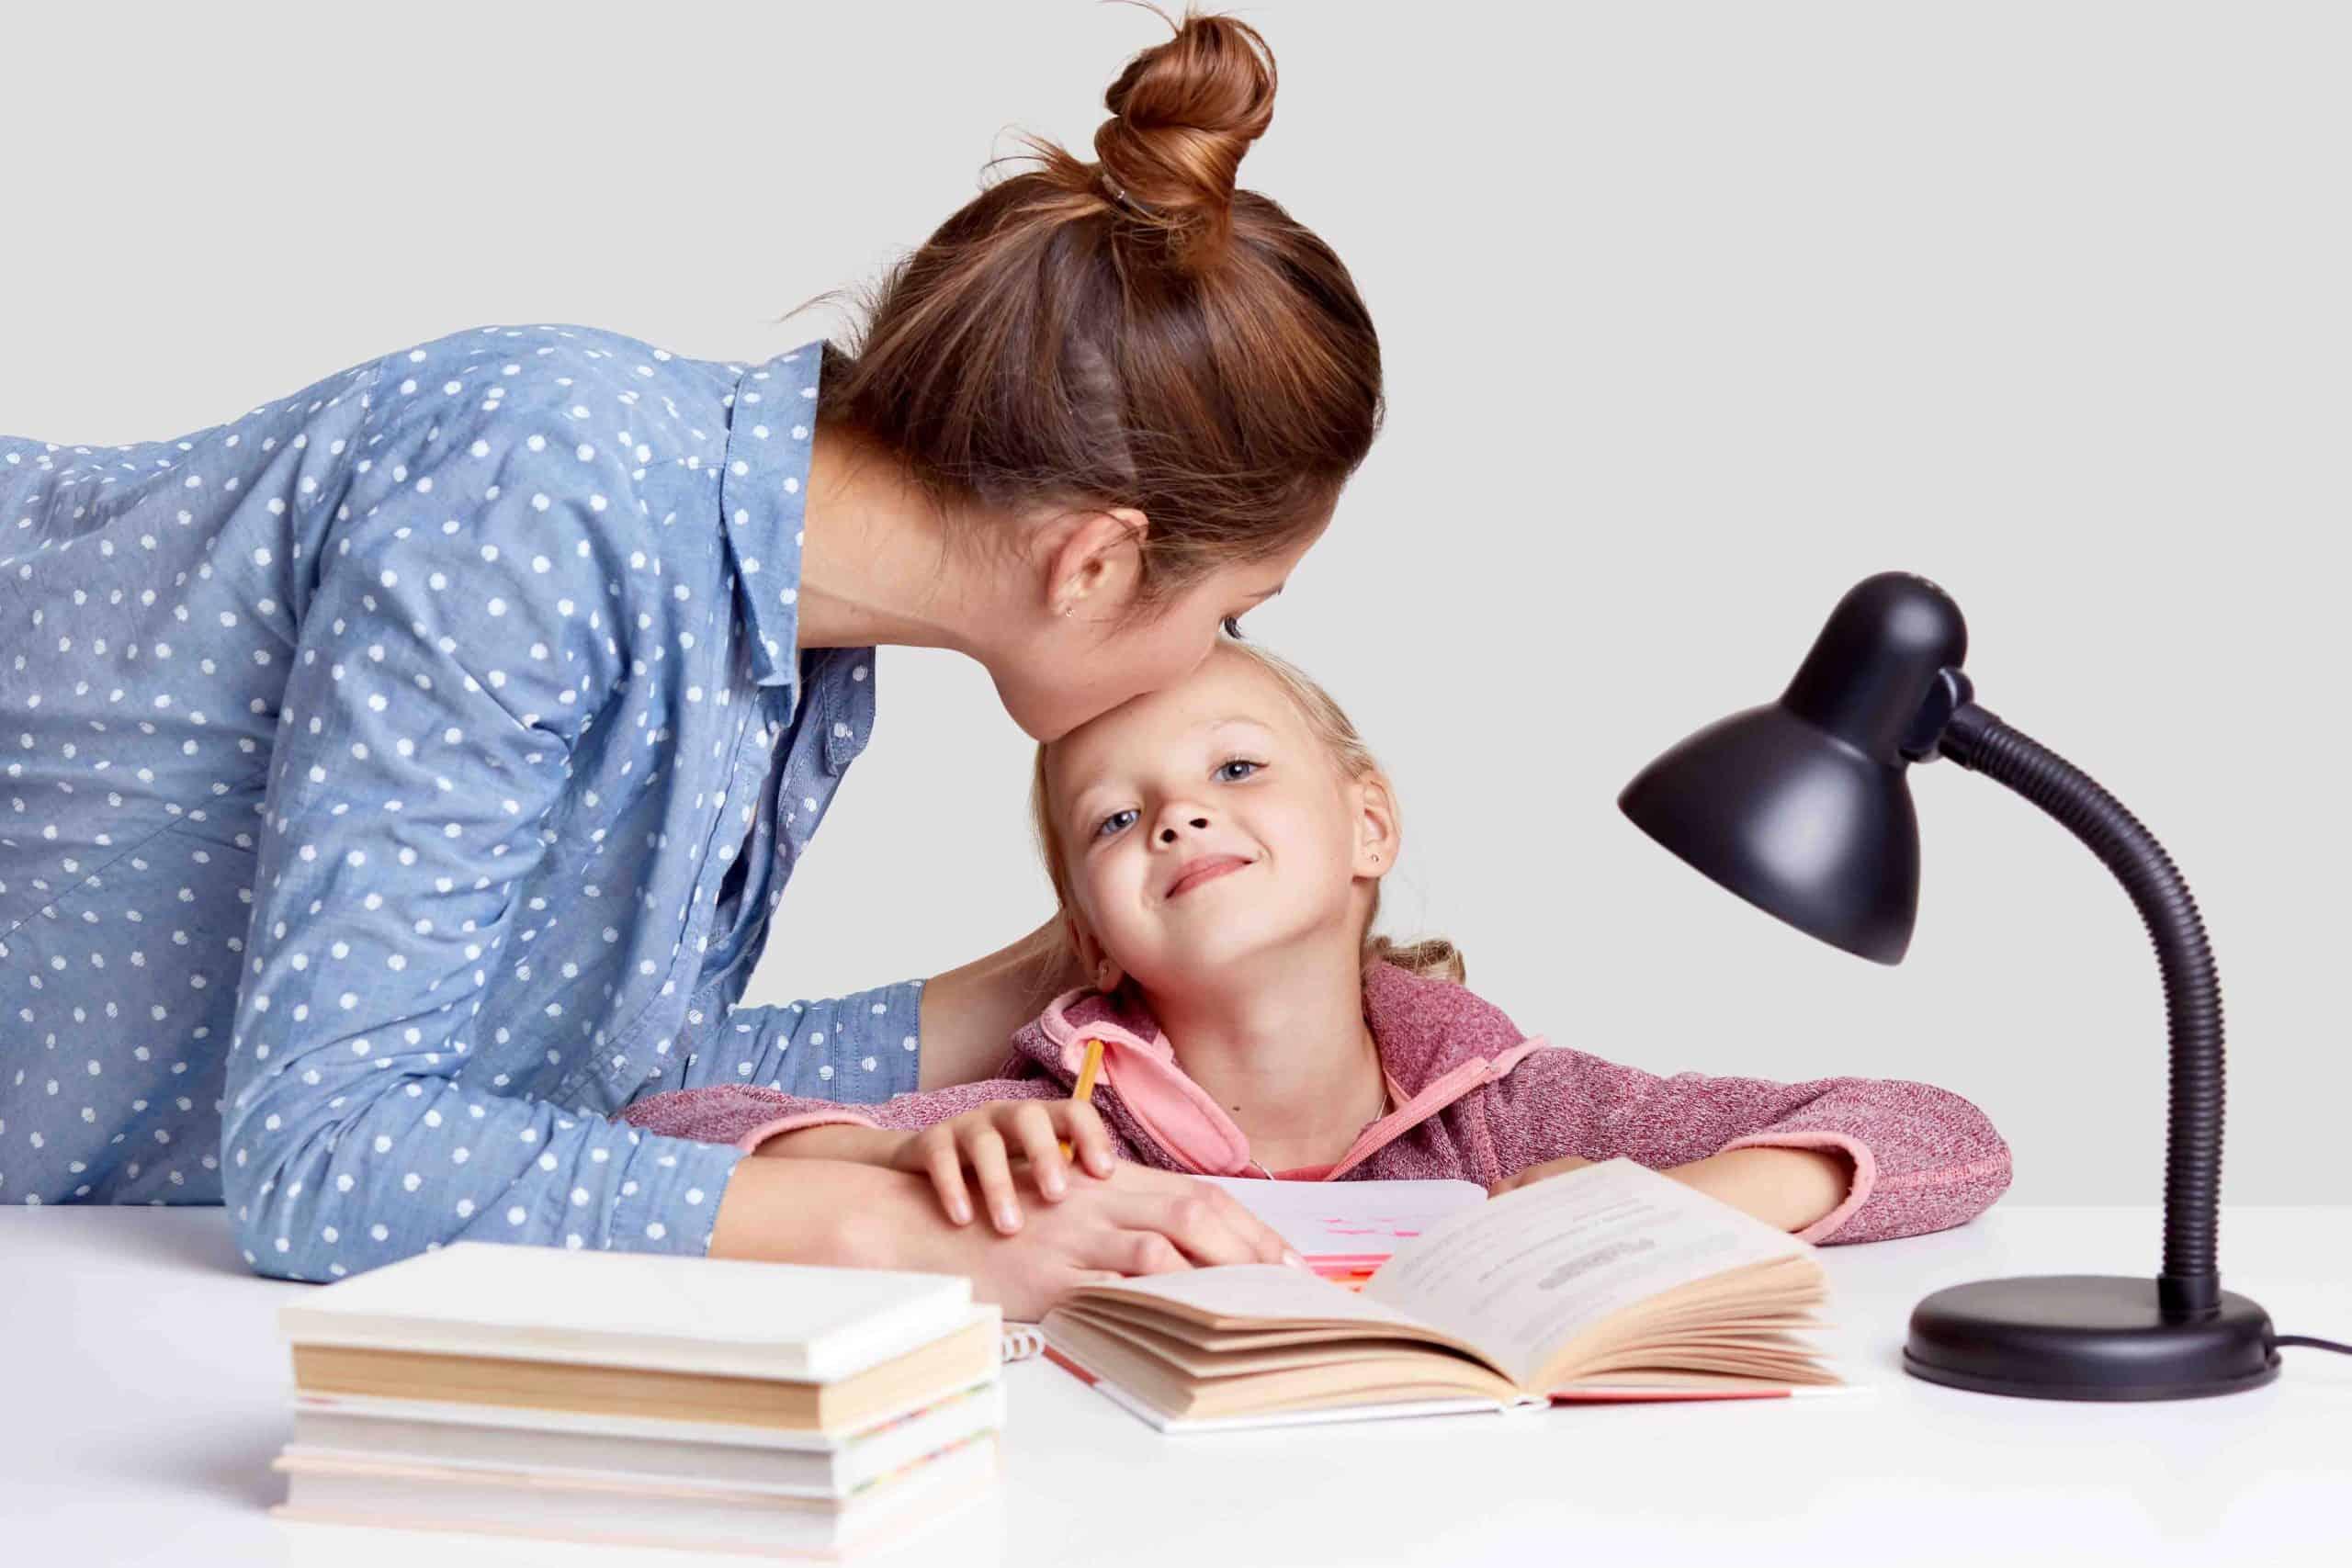 Self-Esteem In Children: A Guide For Parents